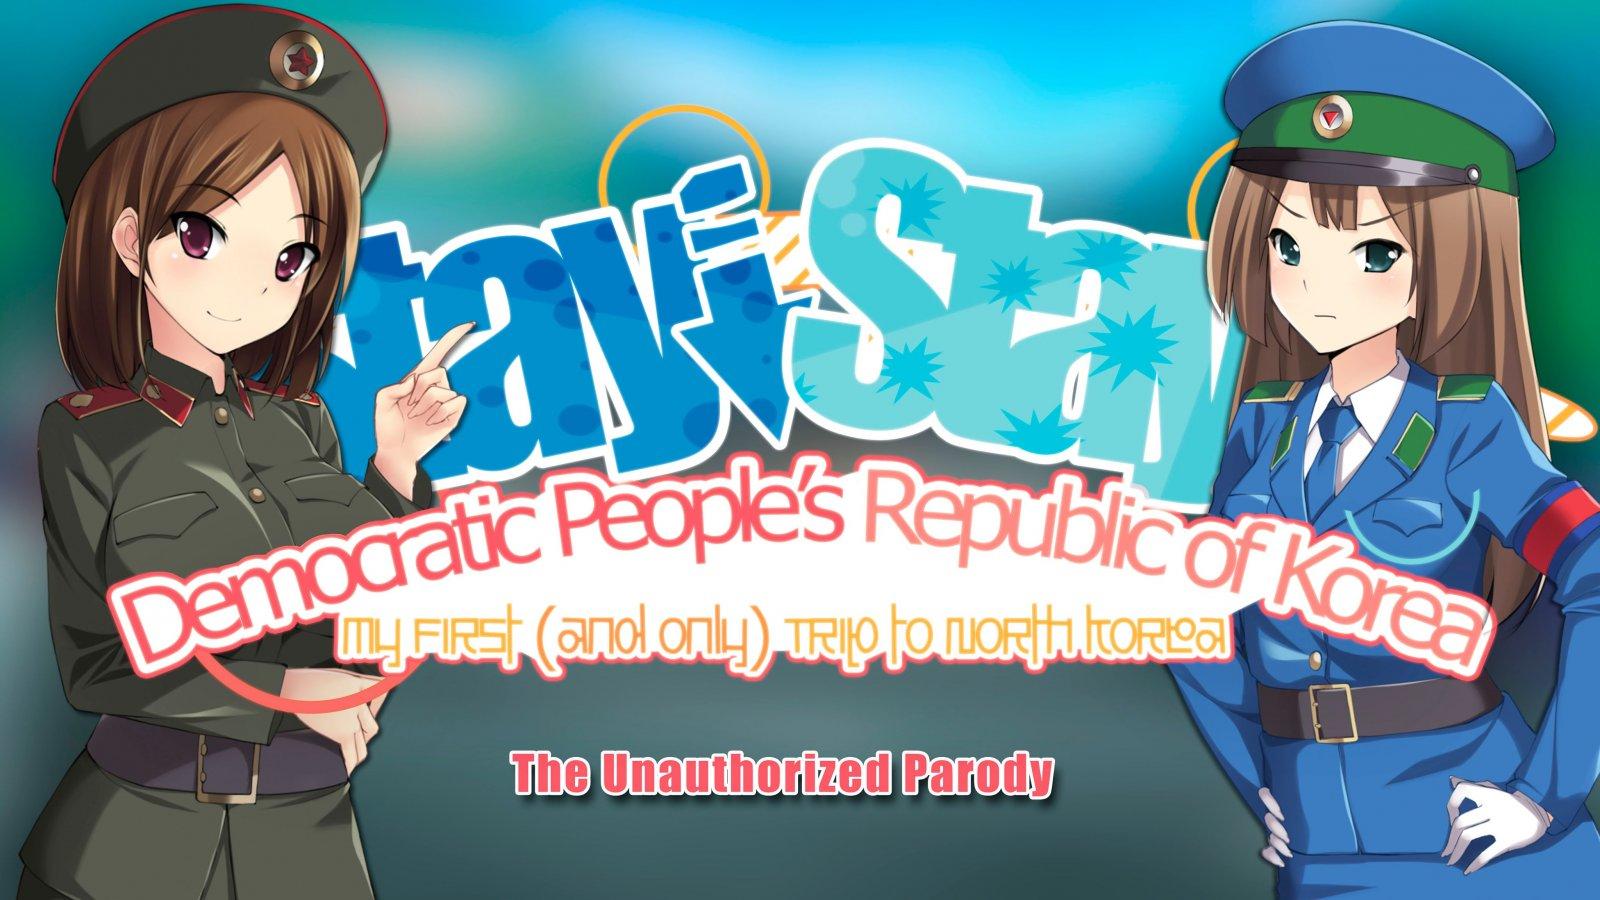 Stay stay democratic people s republic of korea porn